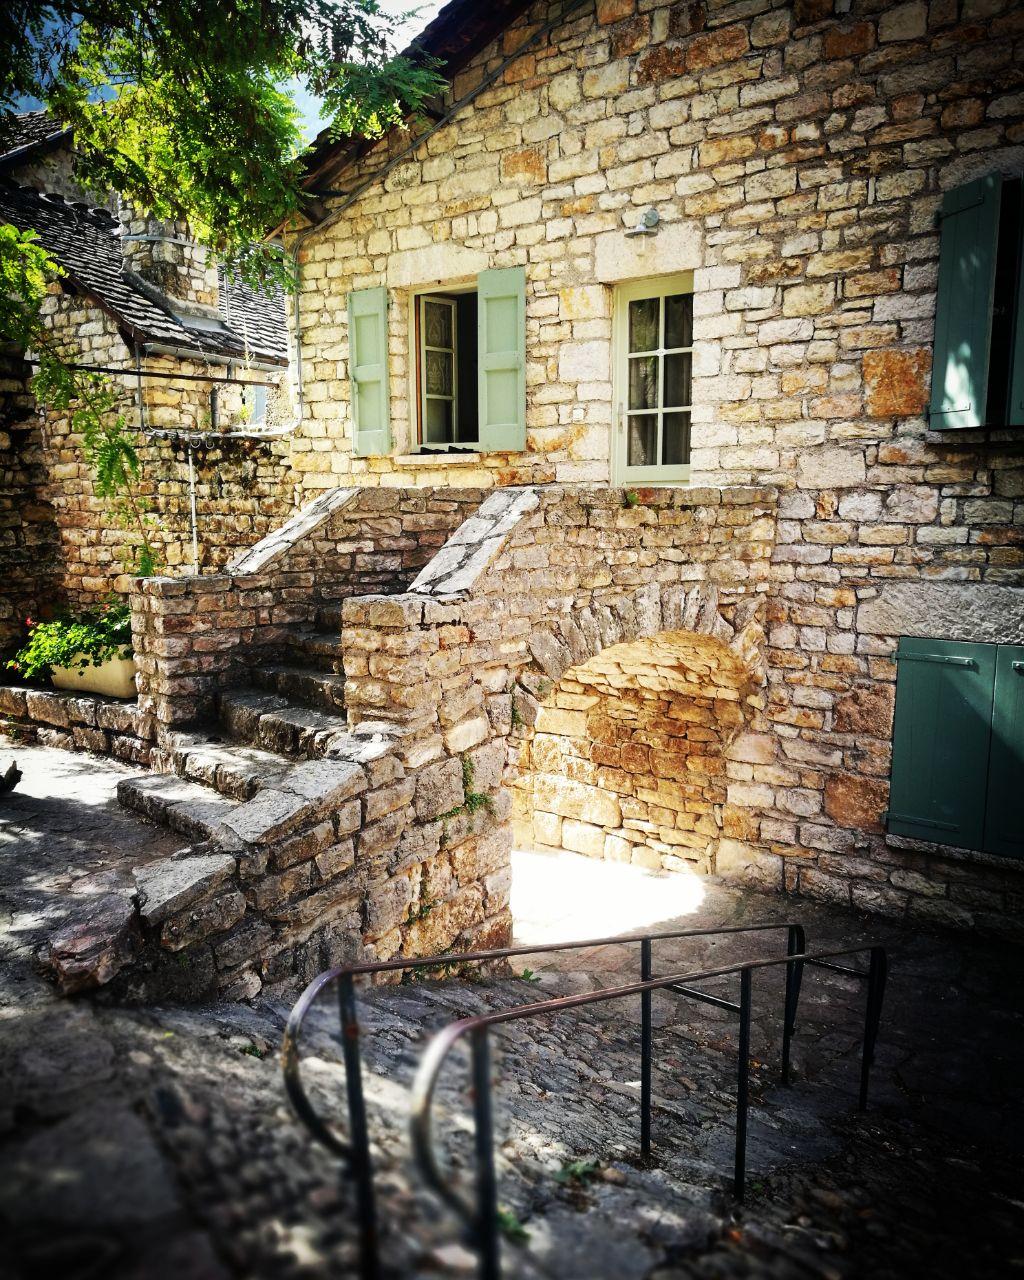 Urlaubstagebuch #5: Sainte-Énimie